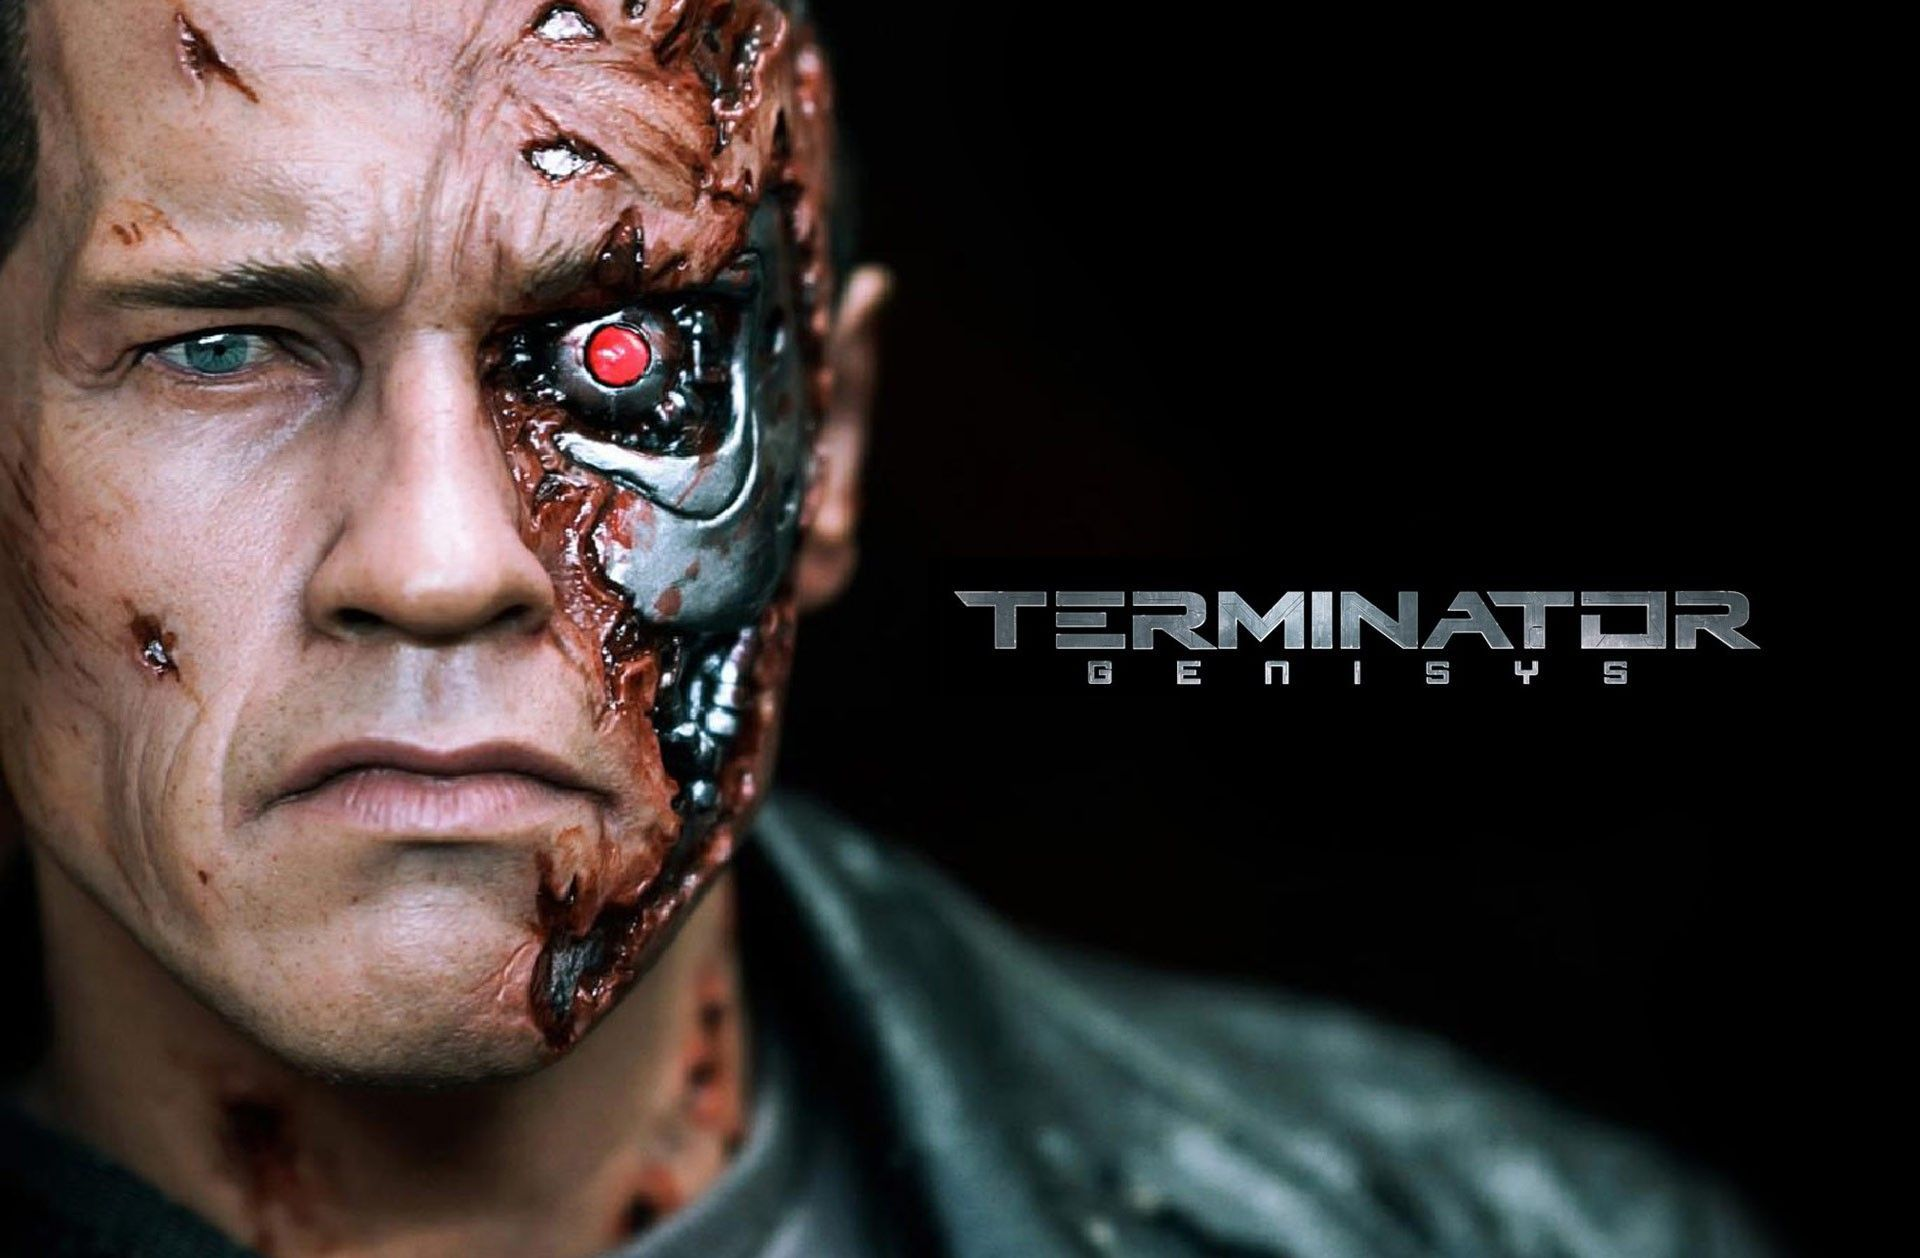 14018 - ¿Sobrevivirías si un Terminator te persiguiese?